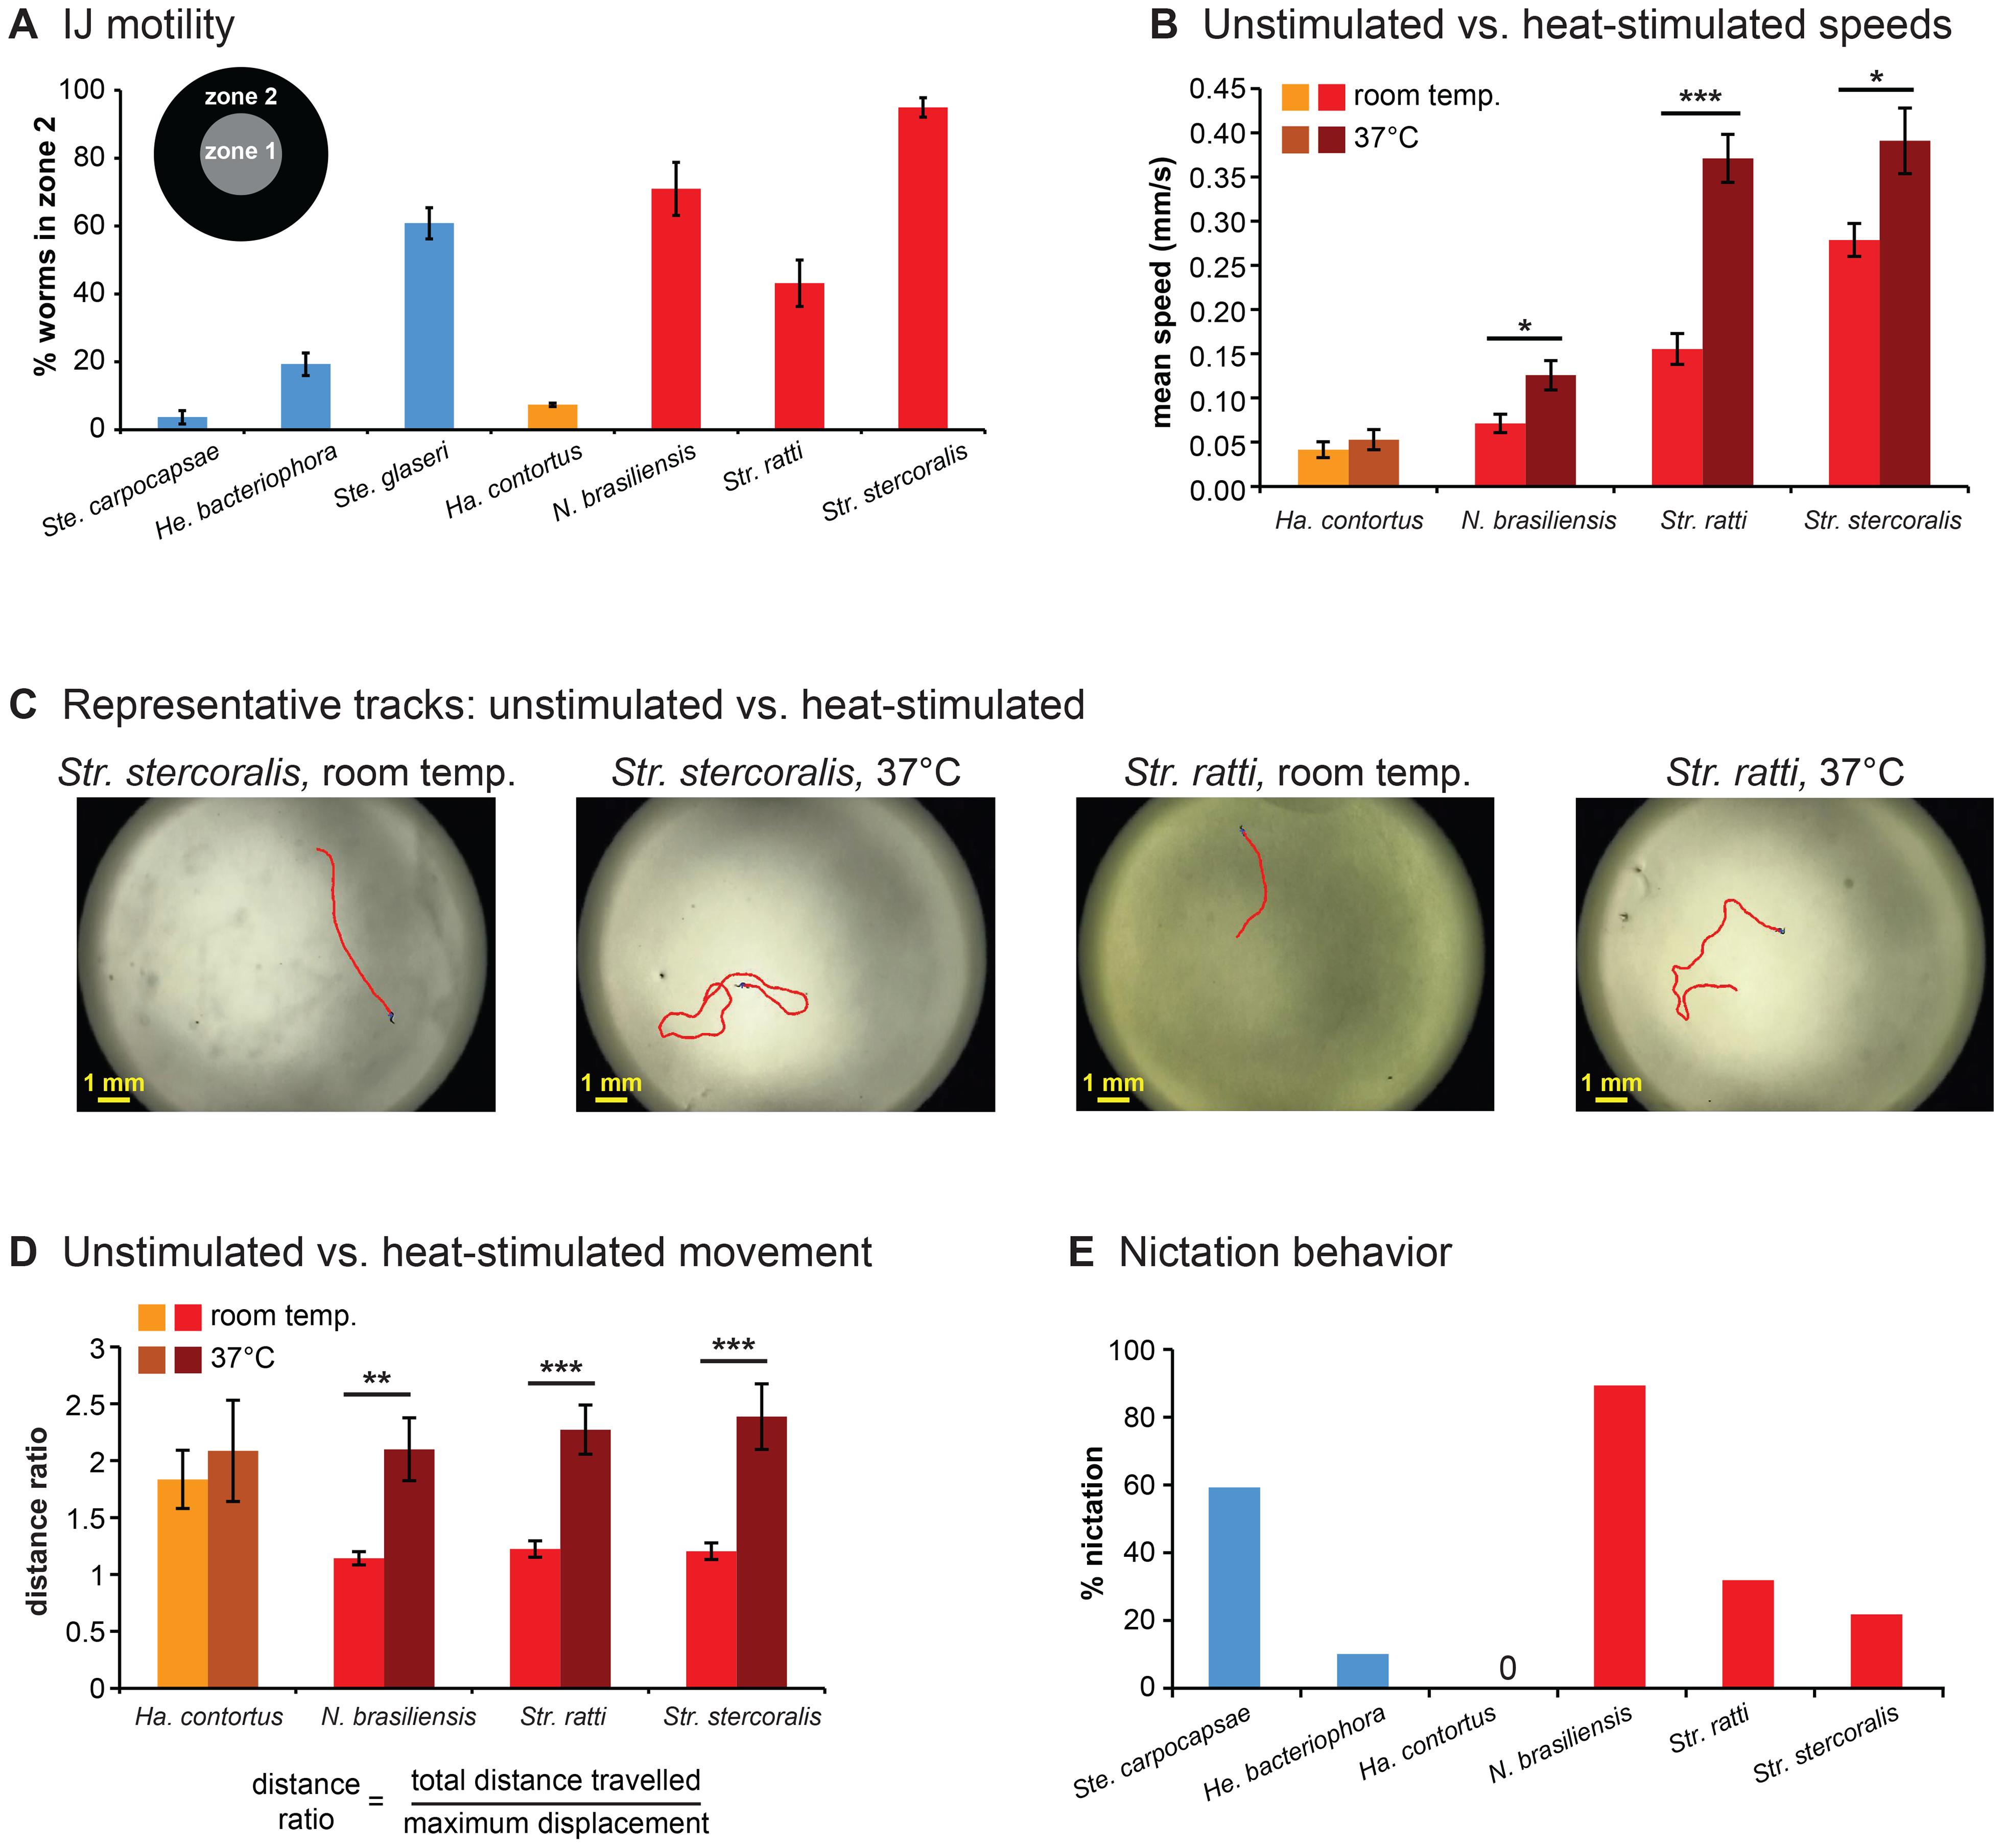 Foraging behaviors of skin-penetrating nematodes.